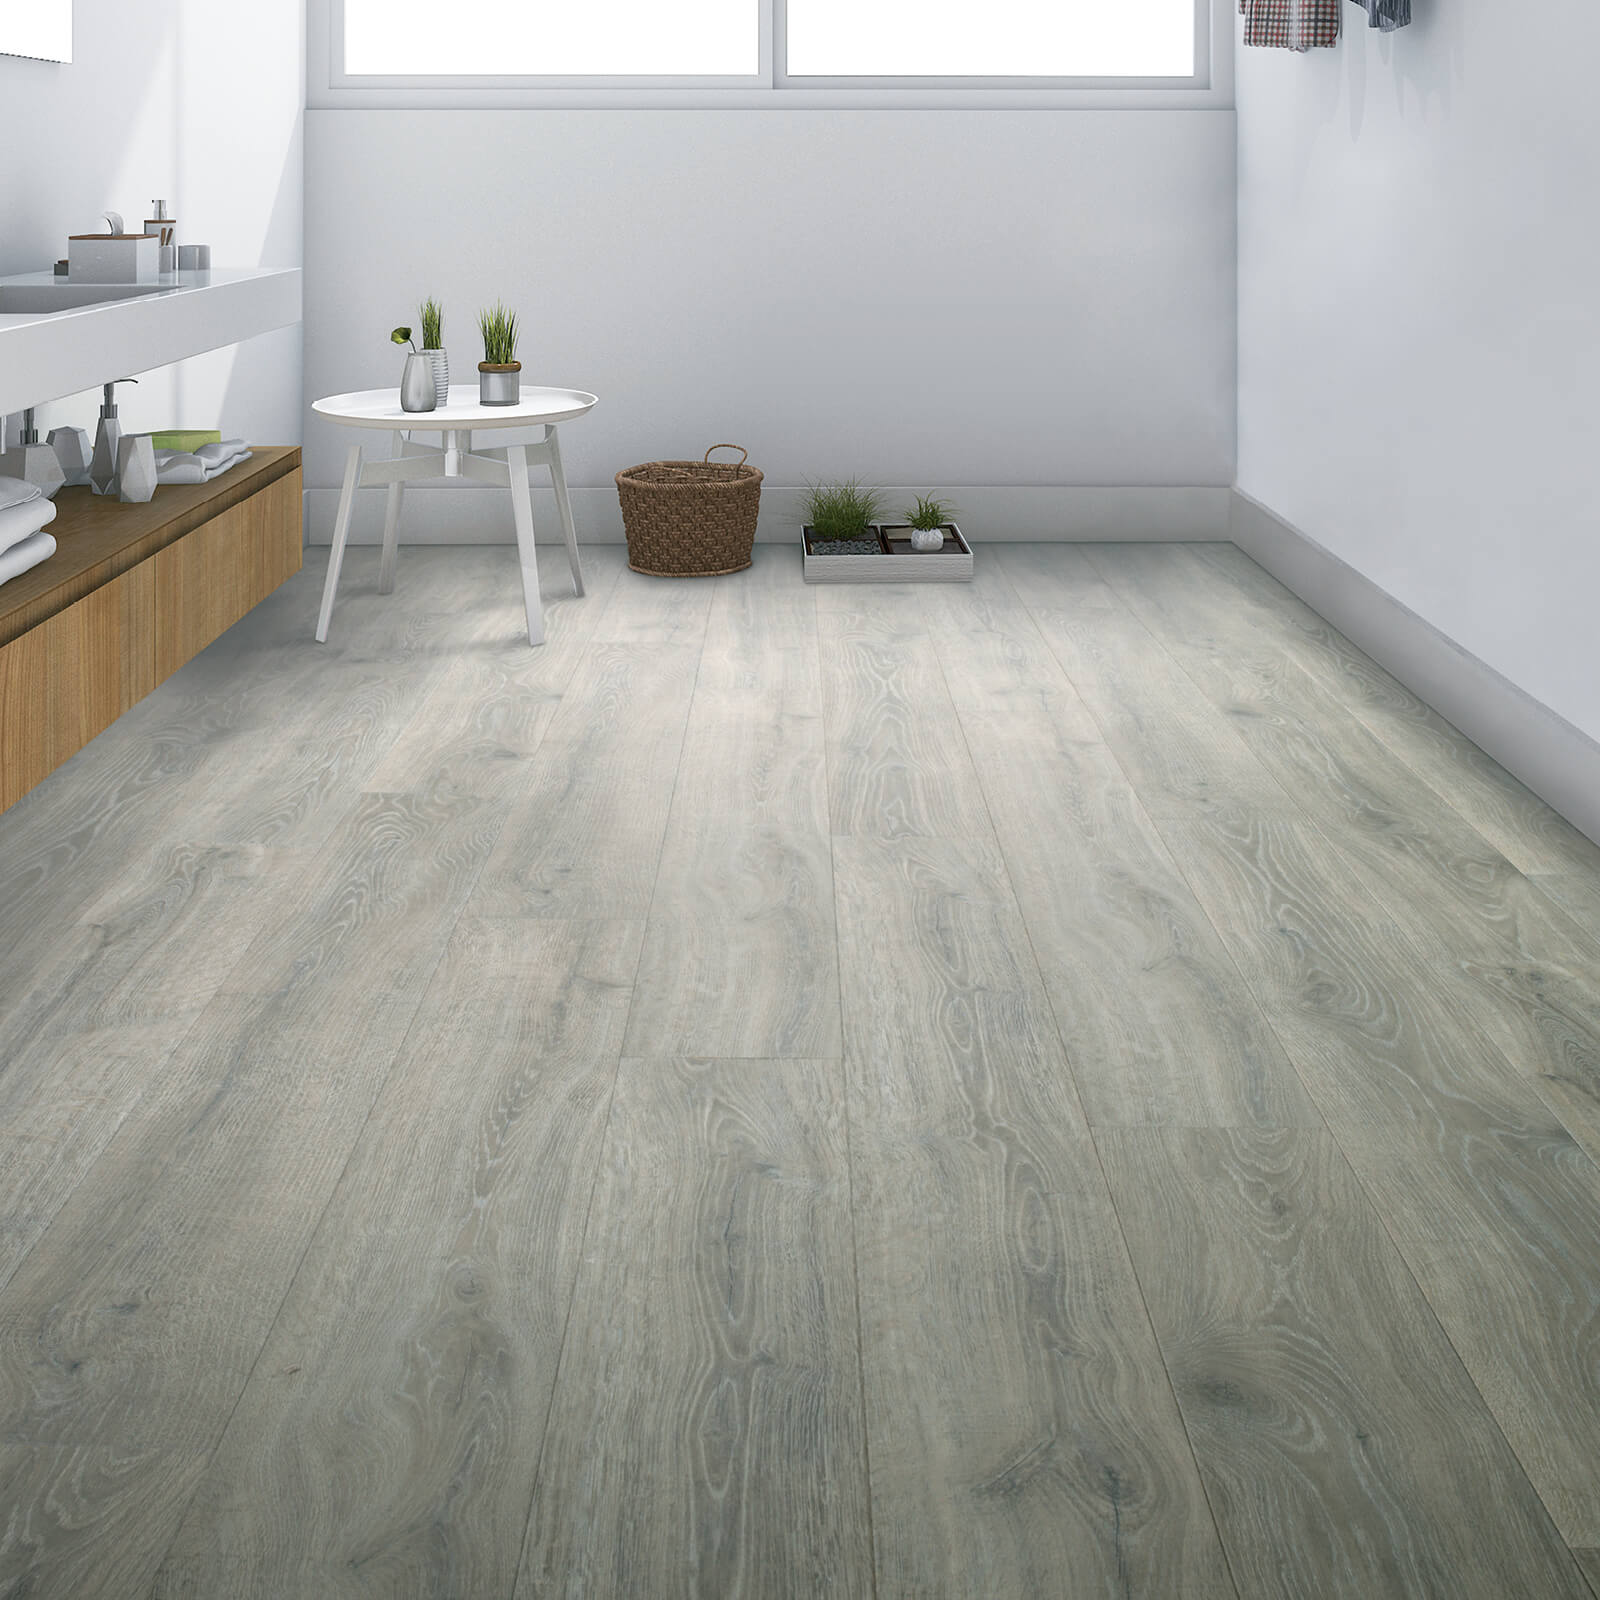 Laminate Flooring Dartmouth, NS| Wacky's Flooring